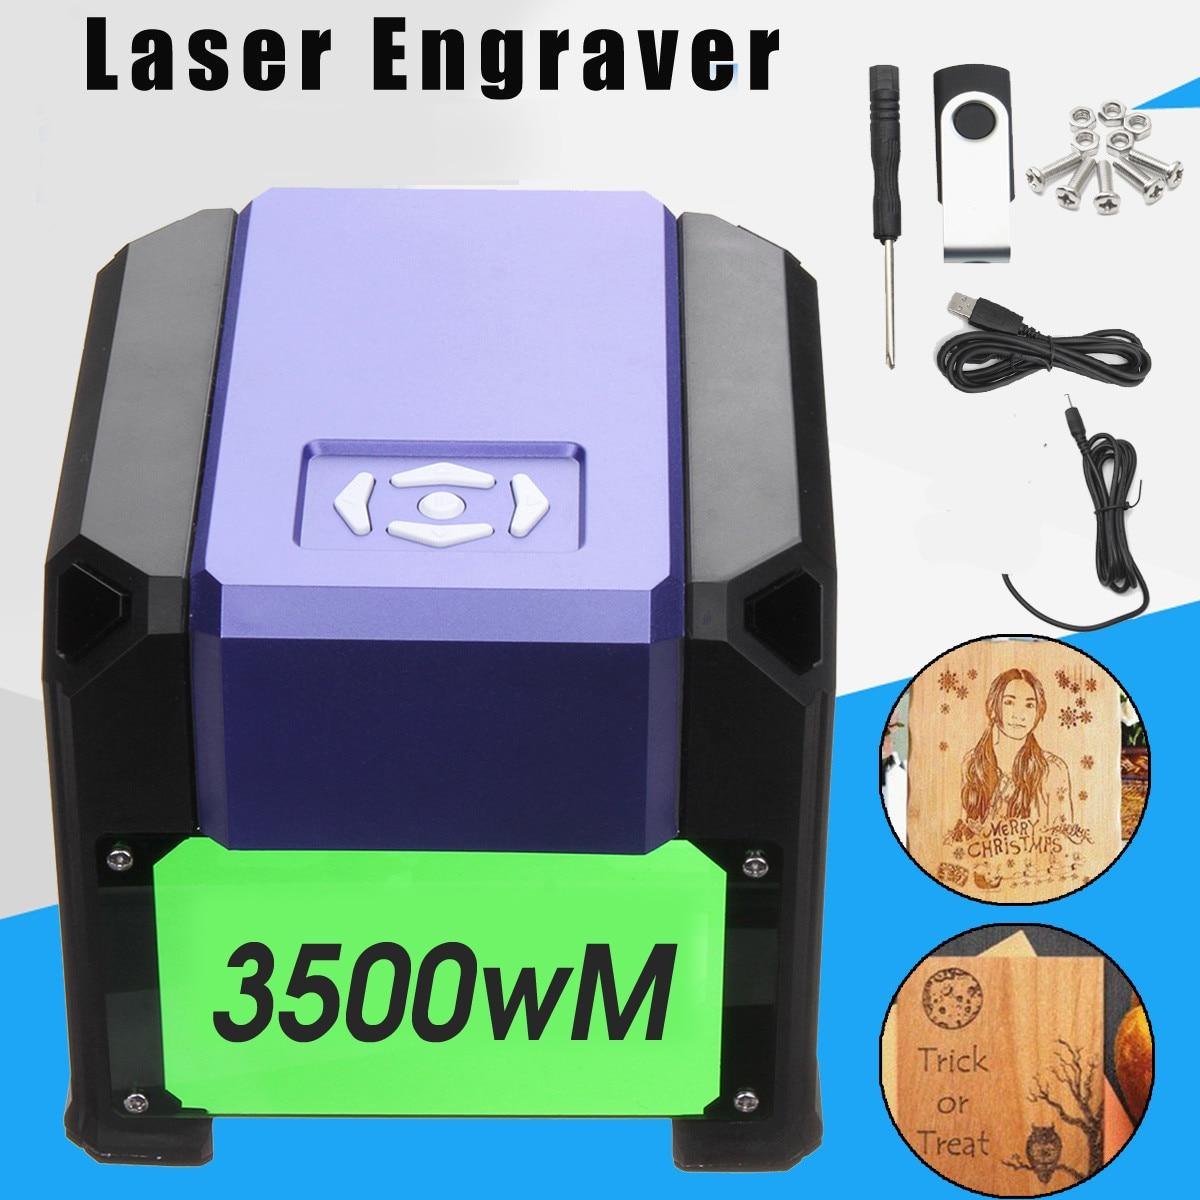 3500mW 80x80mm USB Desktop Mini Laser Engraver Machine Printer DIY Logo Marking Cutter Engraving Range CNC Laser Carving For WIN